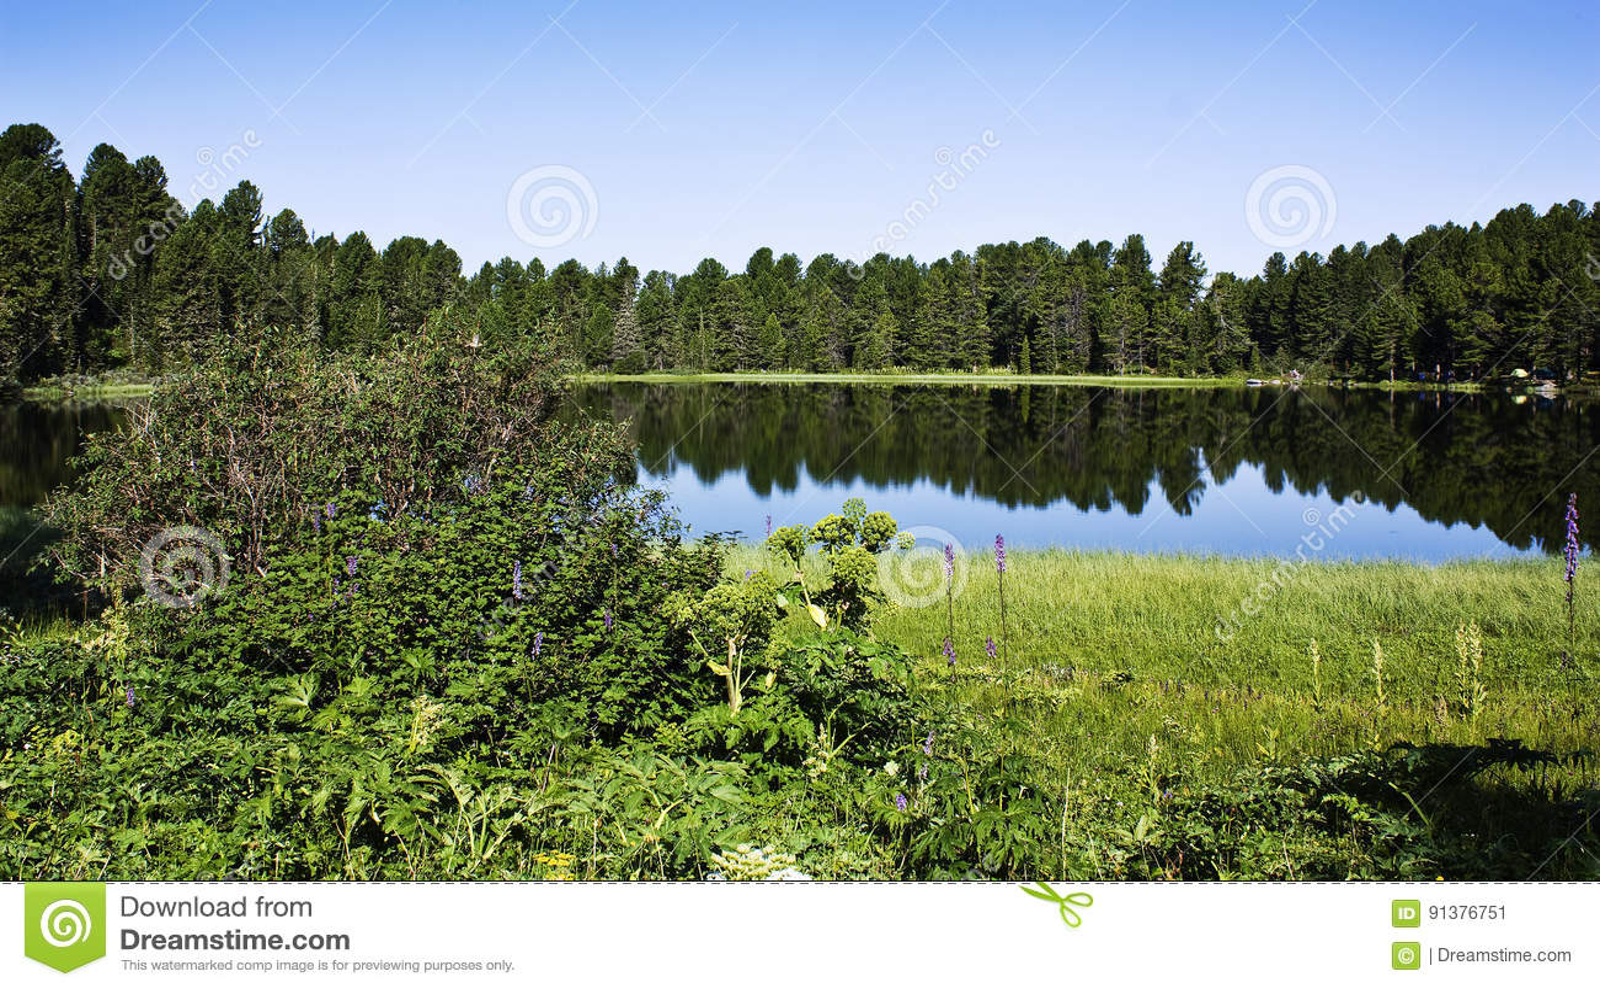 High mountain, inaccessible lake